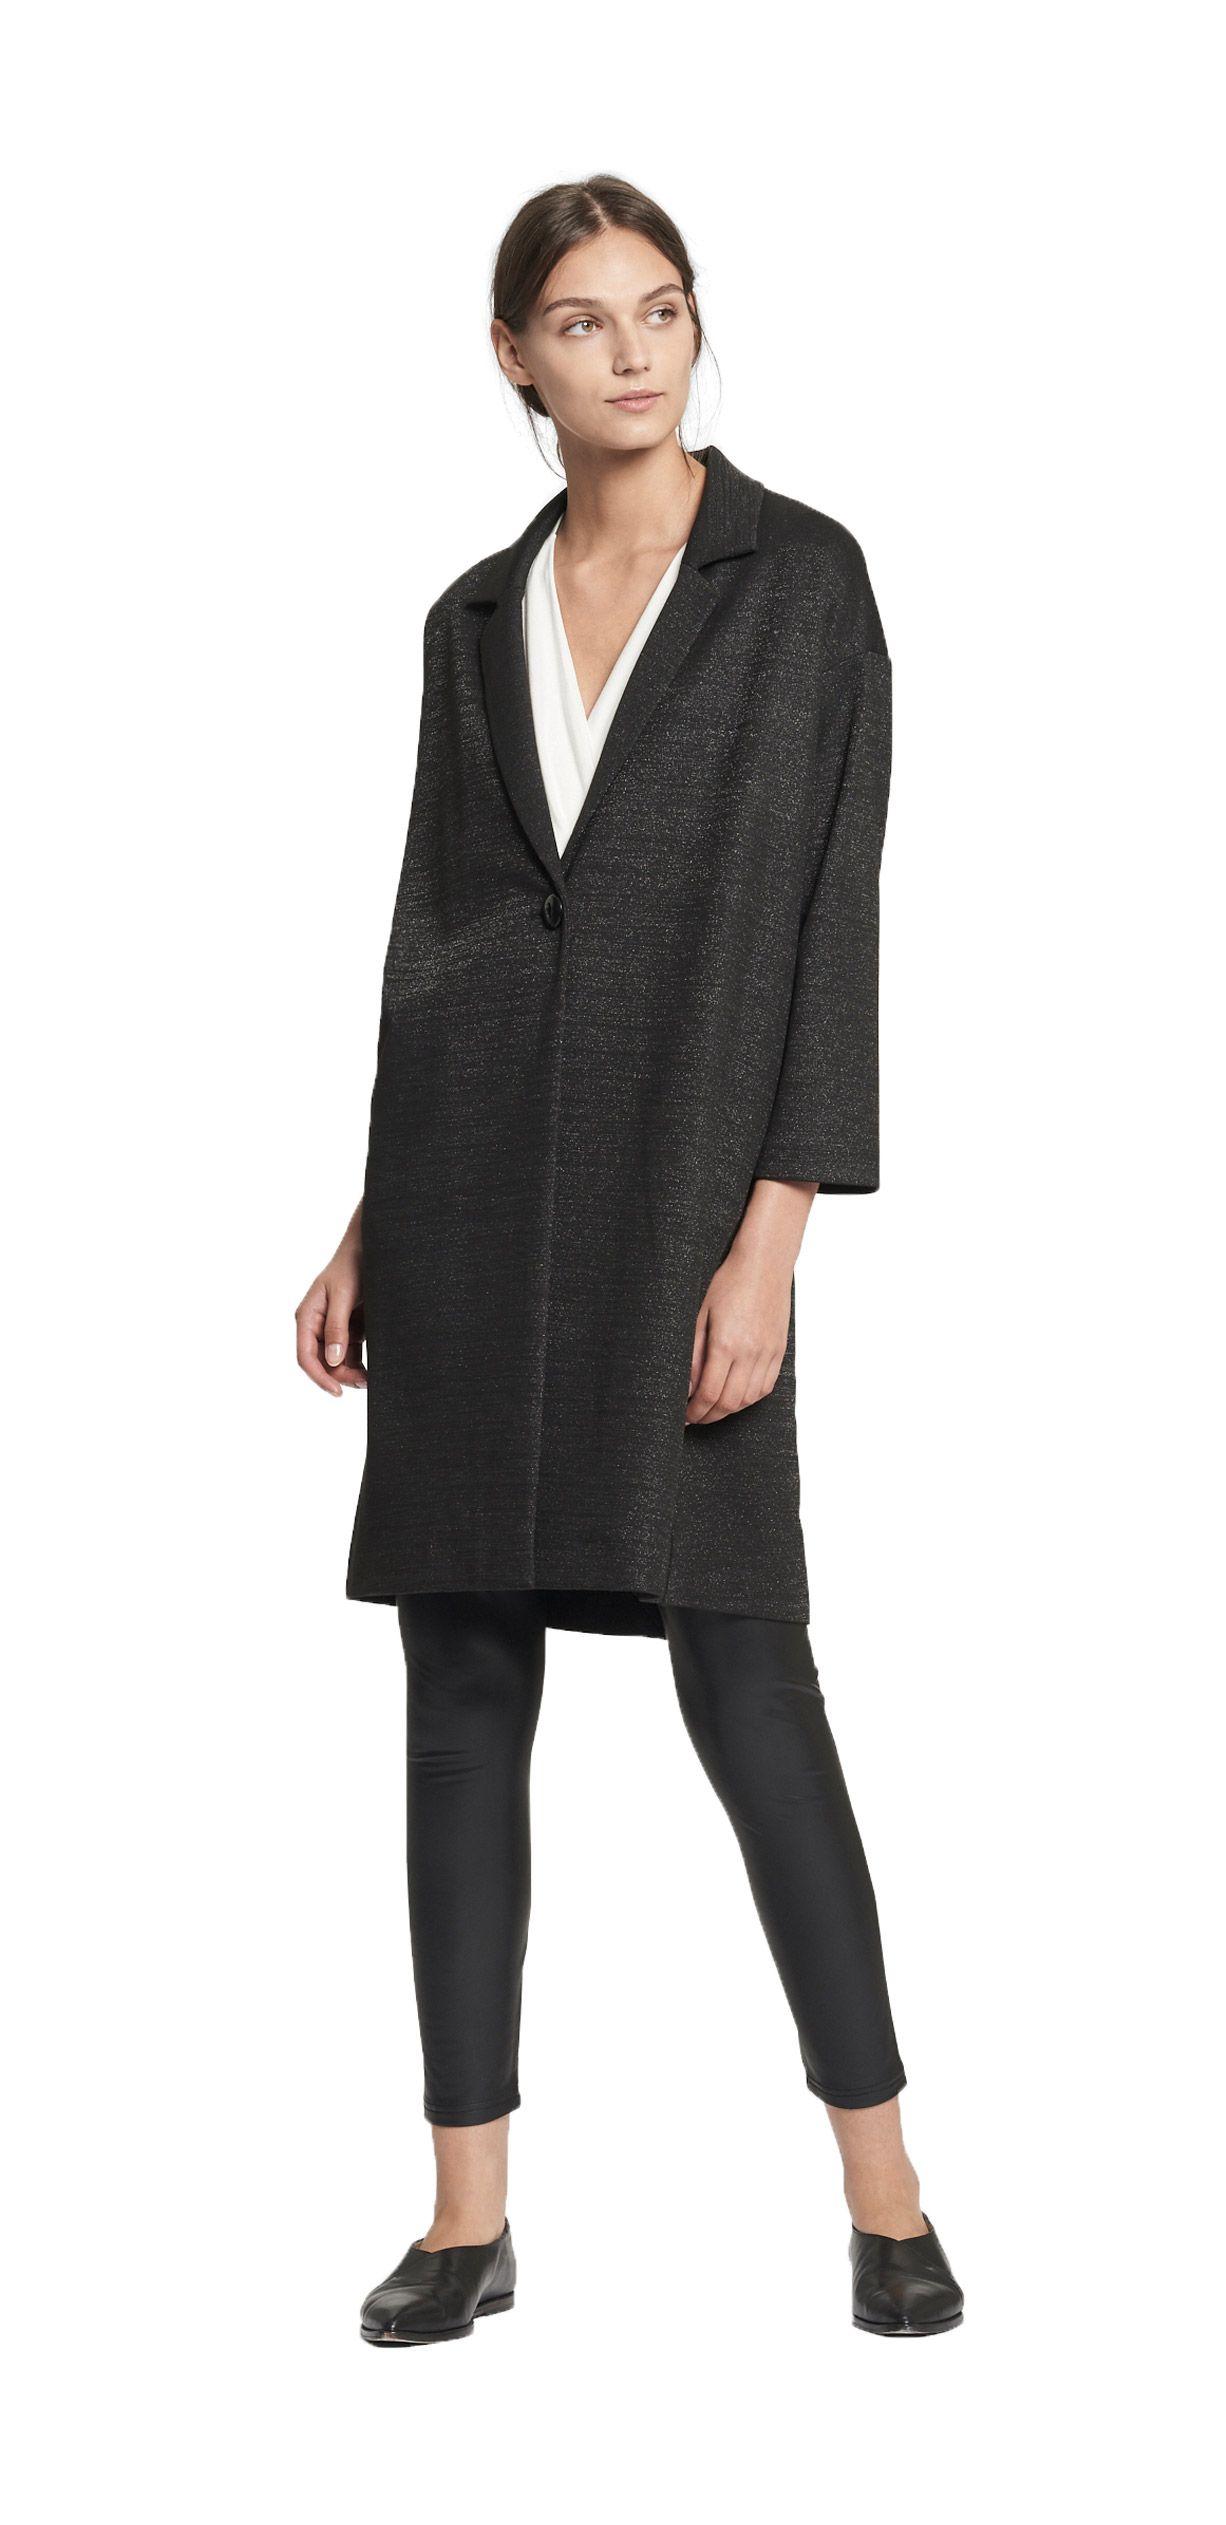 Fall Winter Collection 2017   Clothes   Schwarzes blazer ...